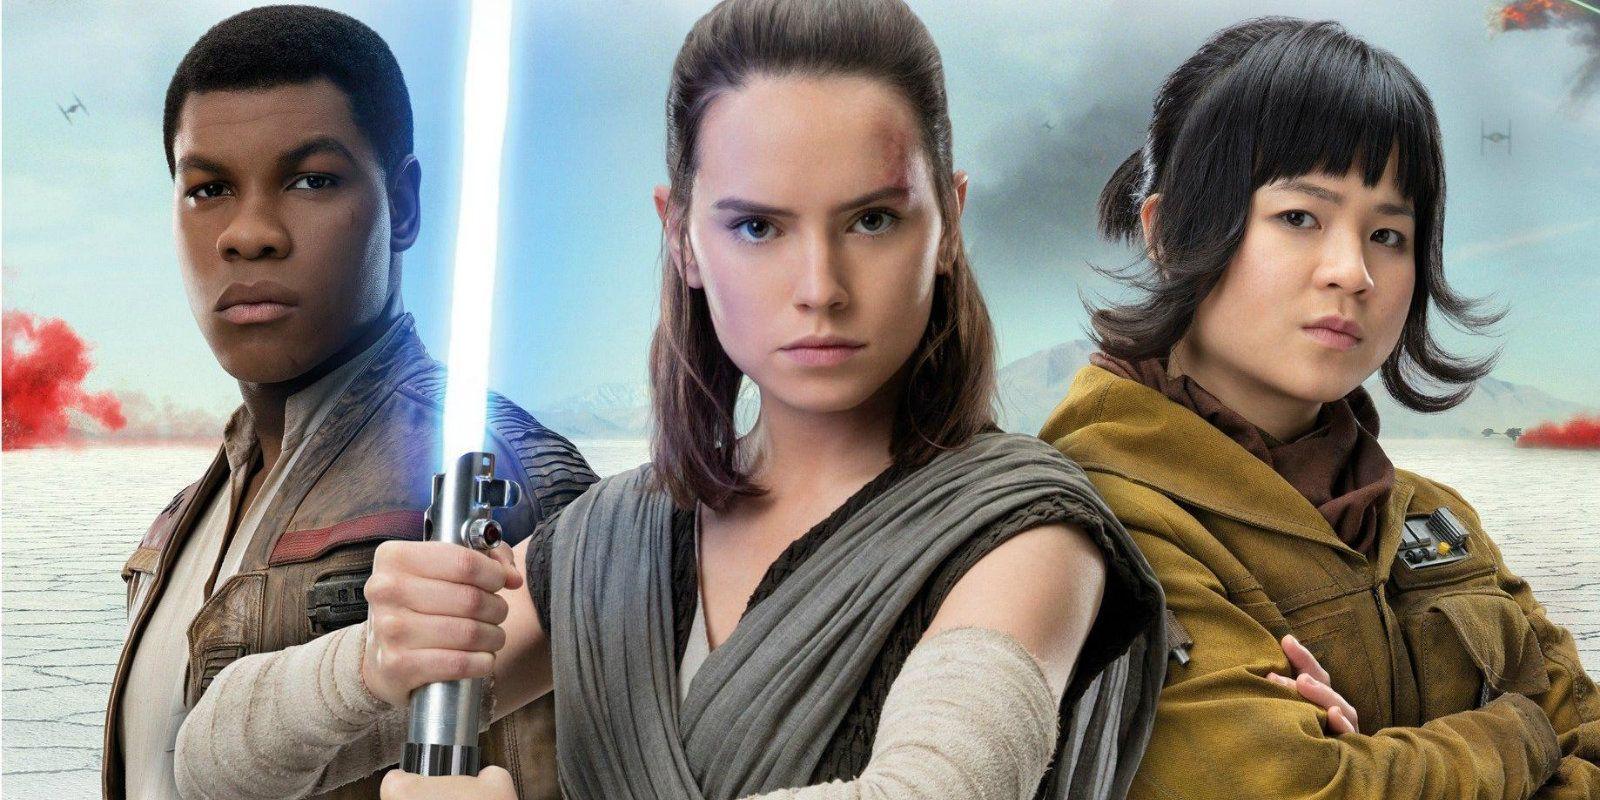 Star-Wars-8-Finn-Rey-Rose